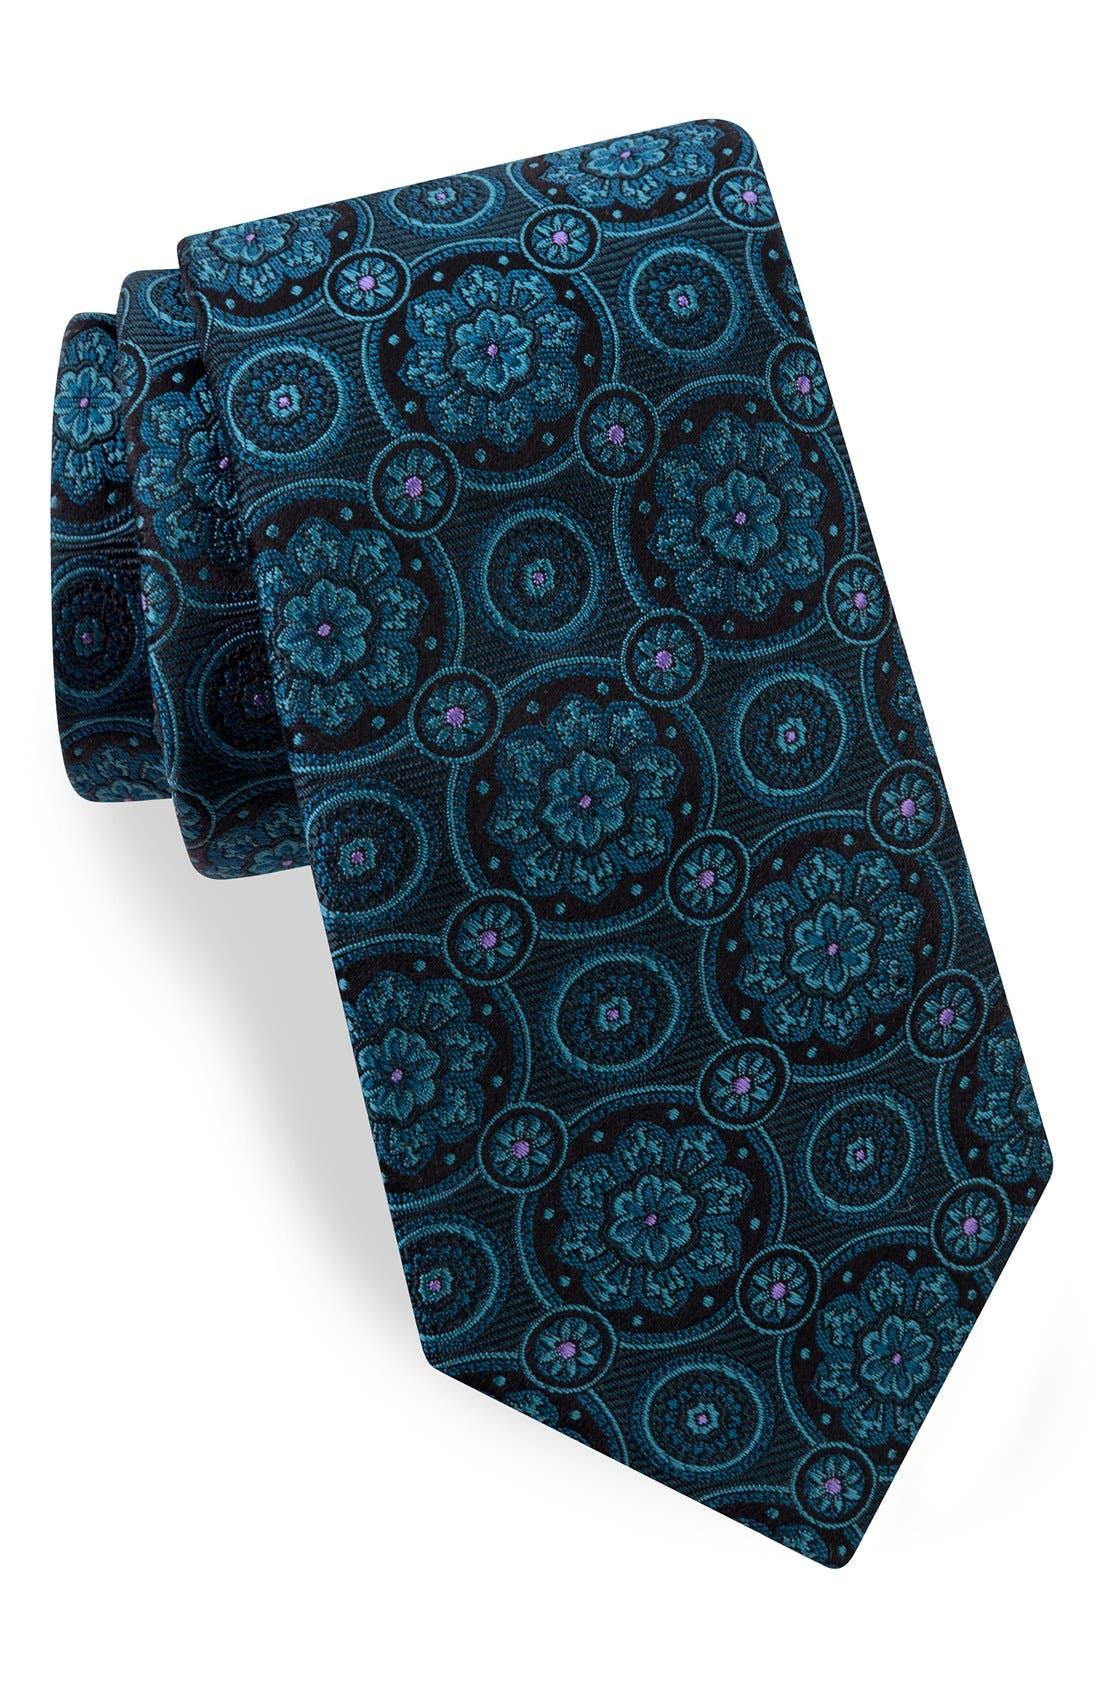 Alternate Image 1 Selected - Ted Baker London Medallion Silk Tie